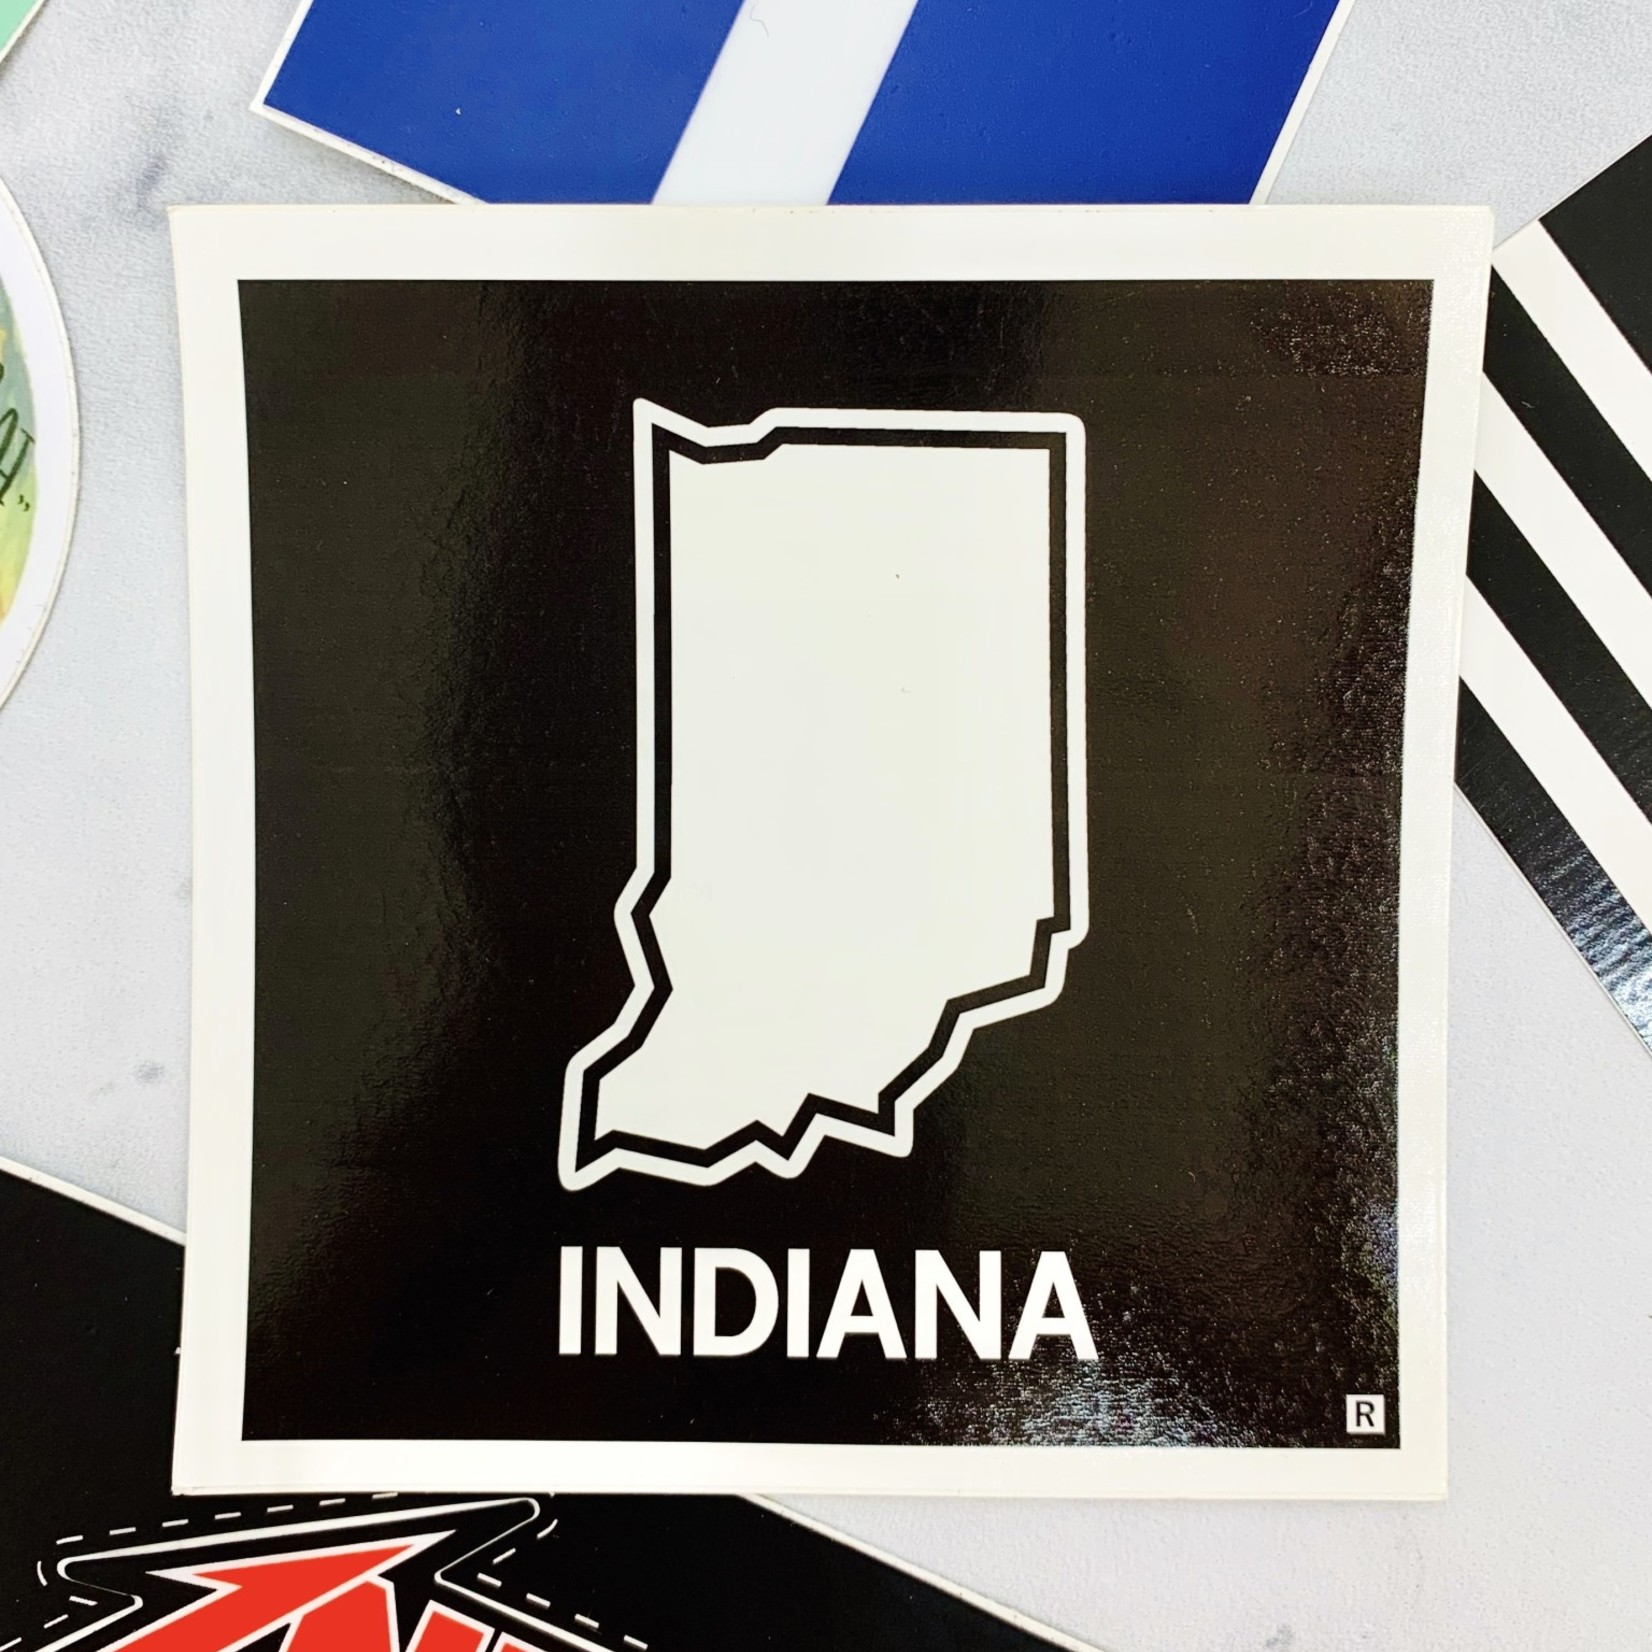 Indiana Outline Sticker